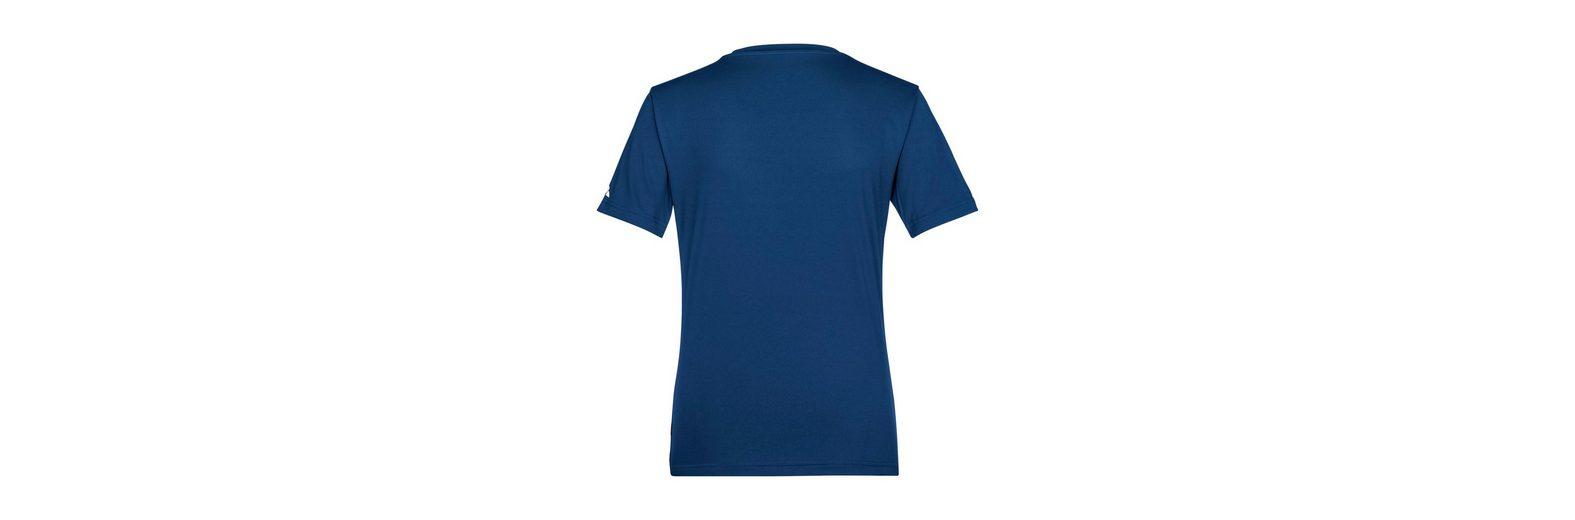 IV Shirt VAUDE T Micro T T Mikeli Micro Shirt T Women Mikeli VAUDE Shirt IV 81wqPA